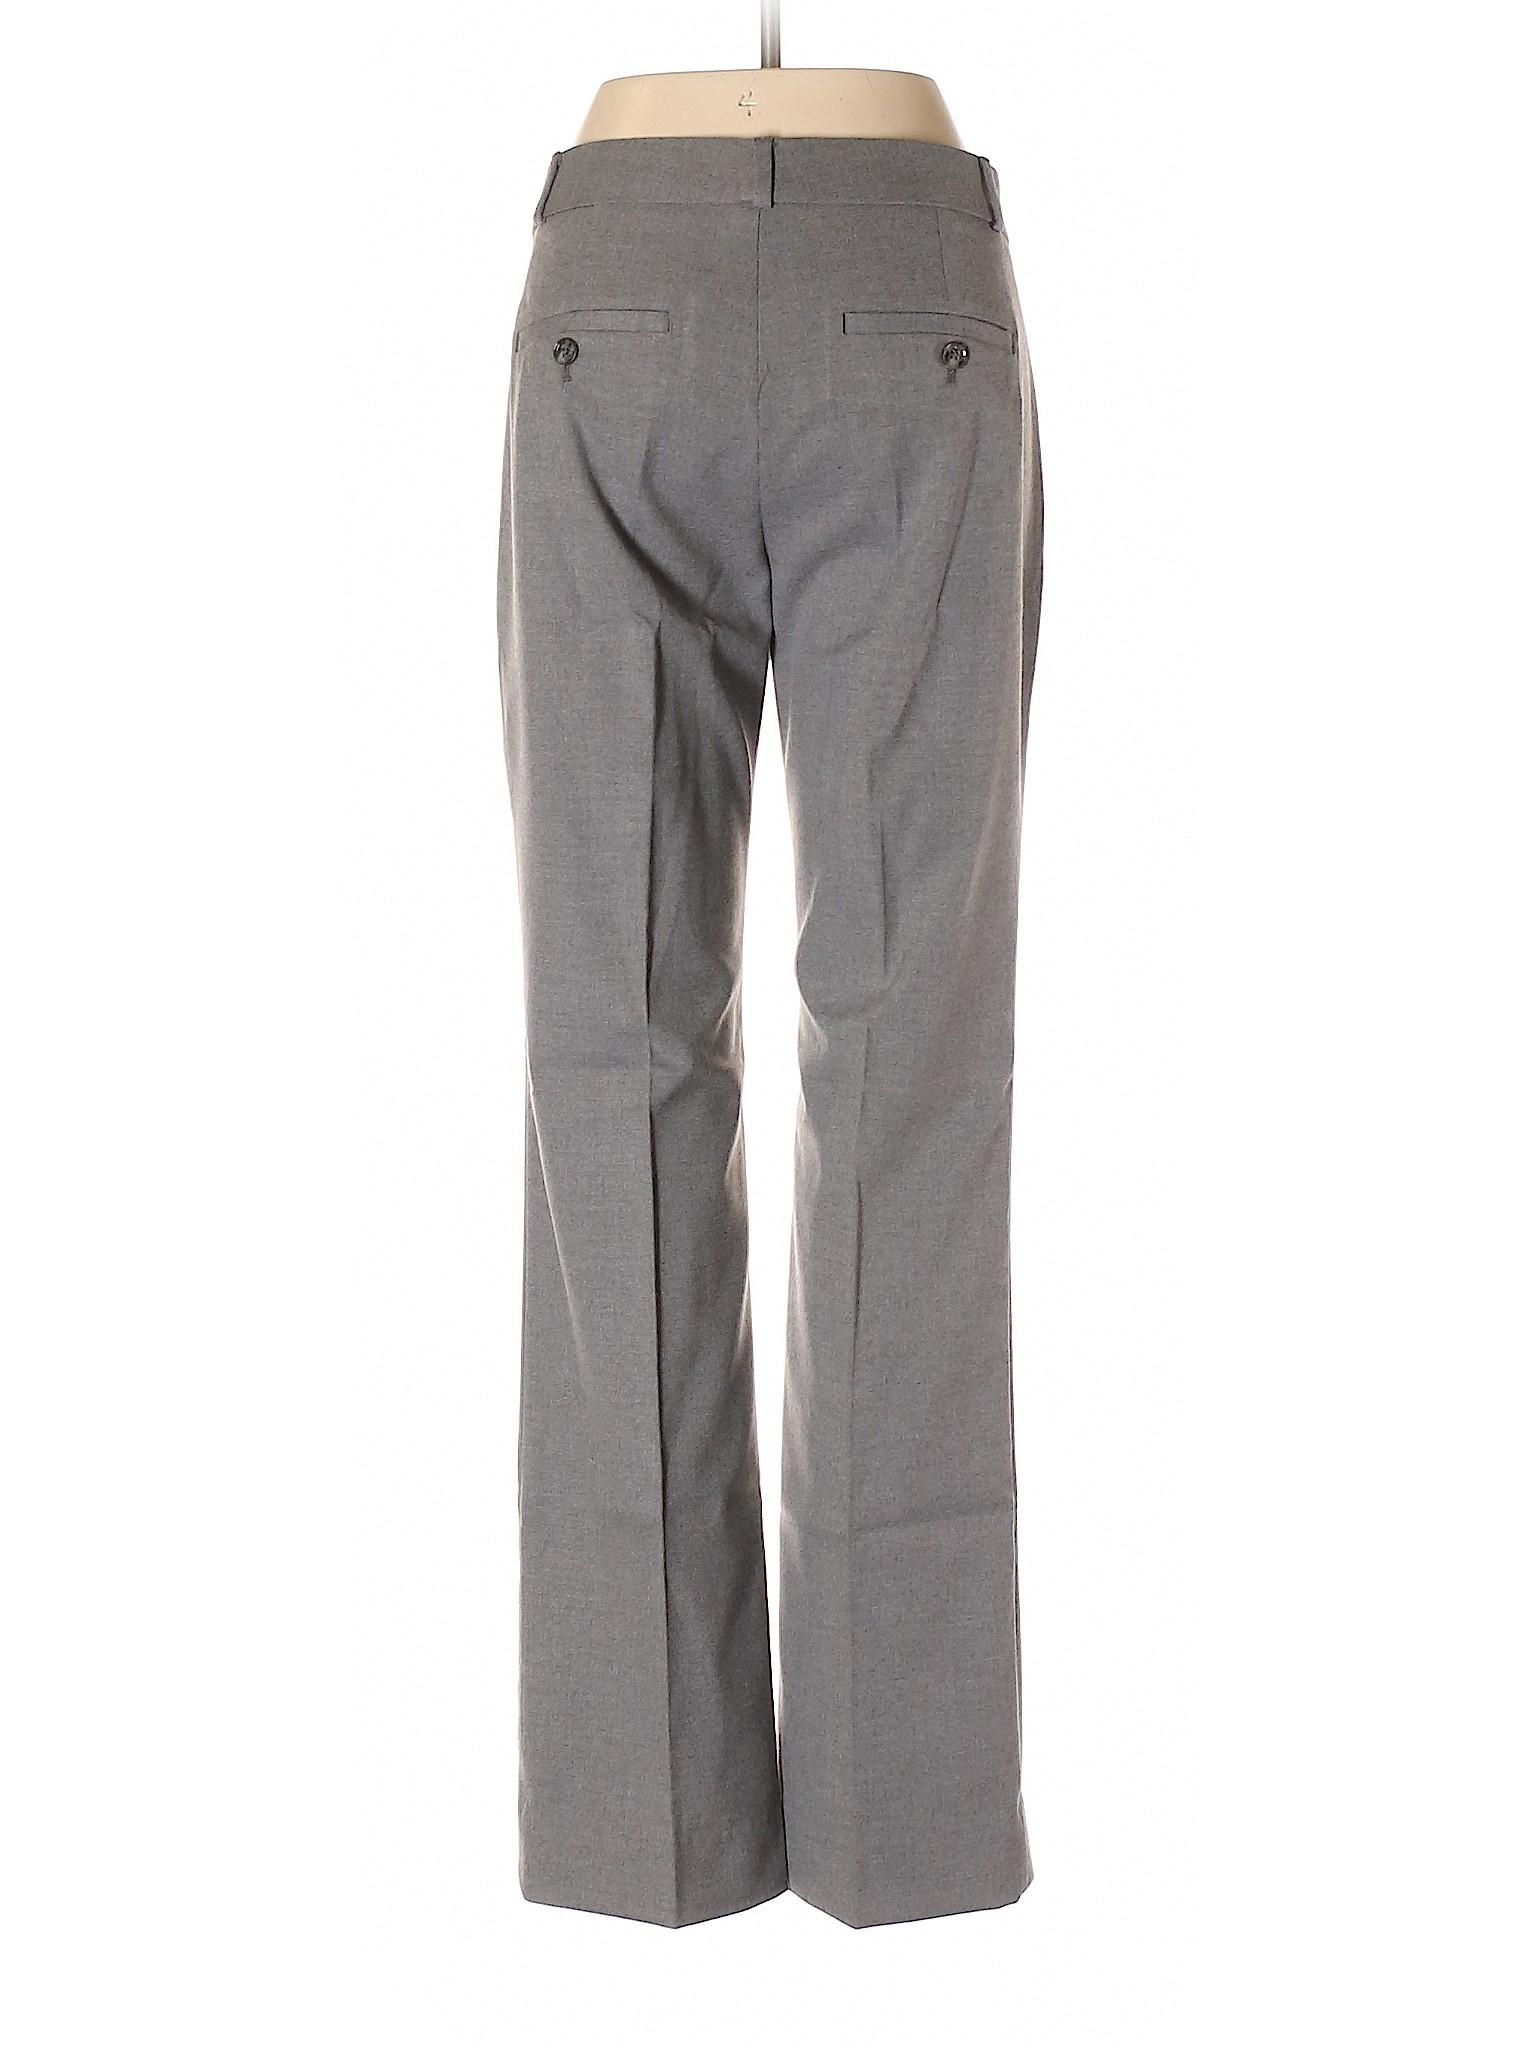 Banana Boutique Pants Republic leisure Dress 5qSqvBf